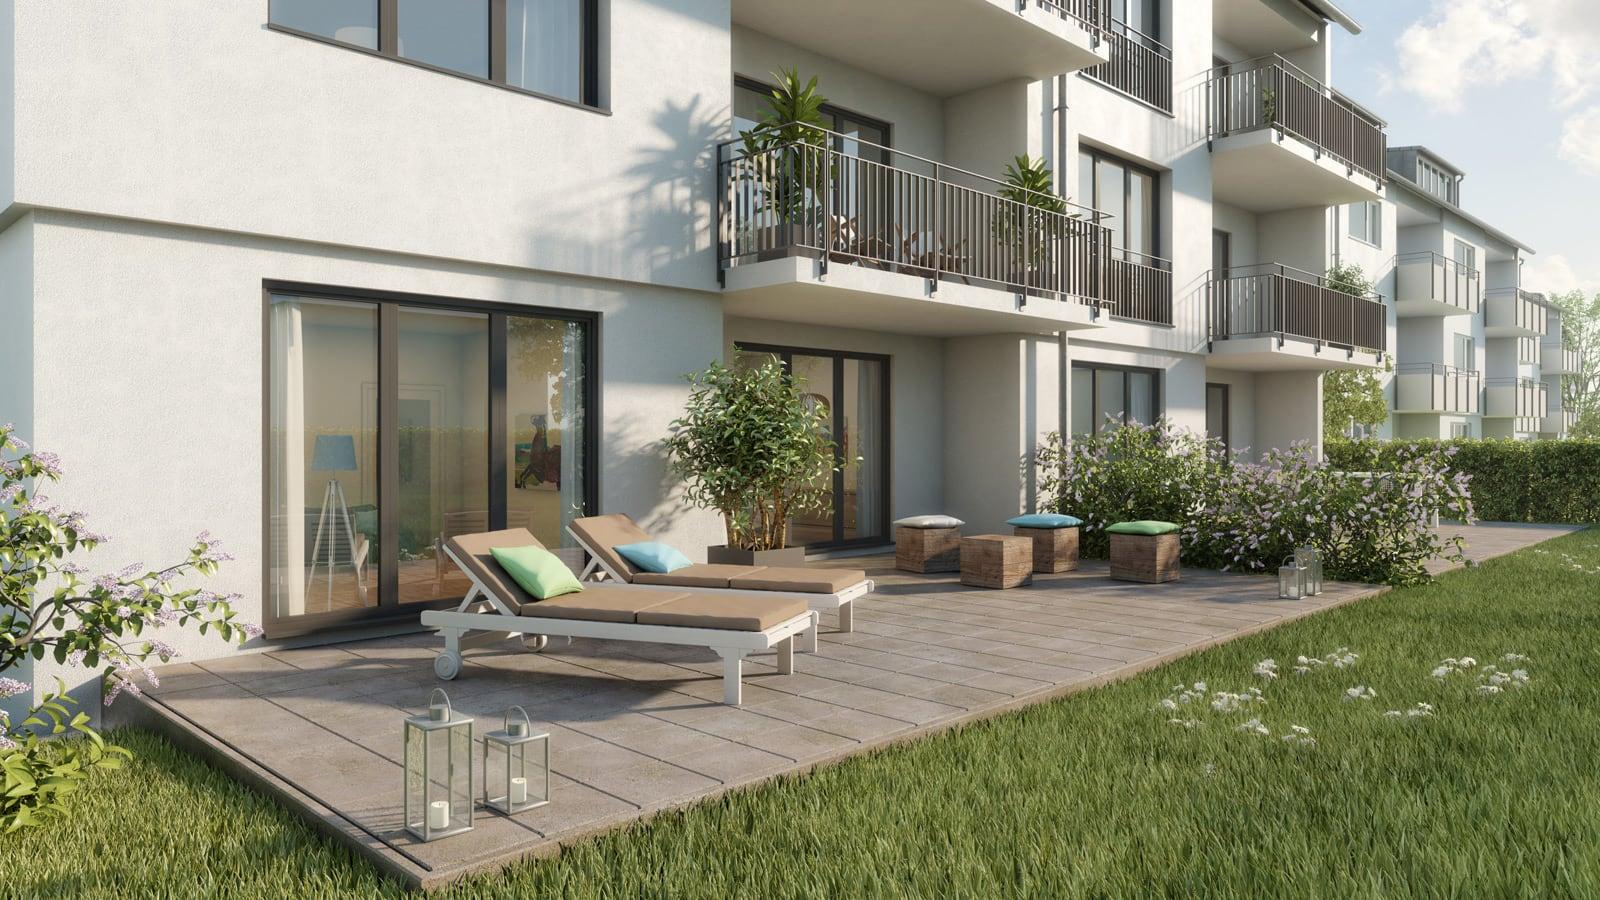 Immobilie Haeckerstraße 12: großzügige Terrasse